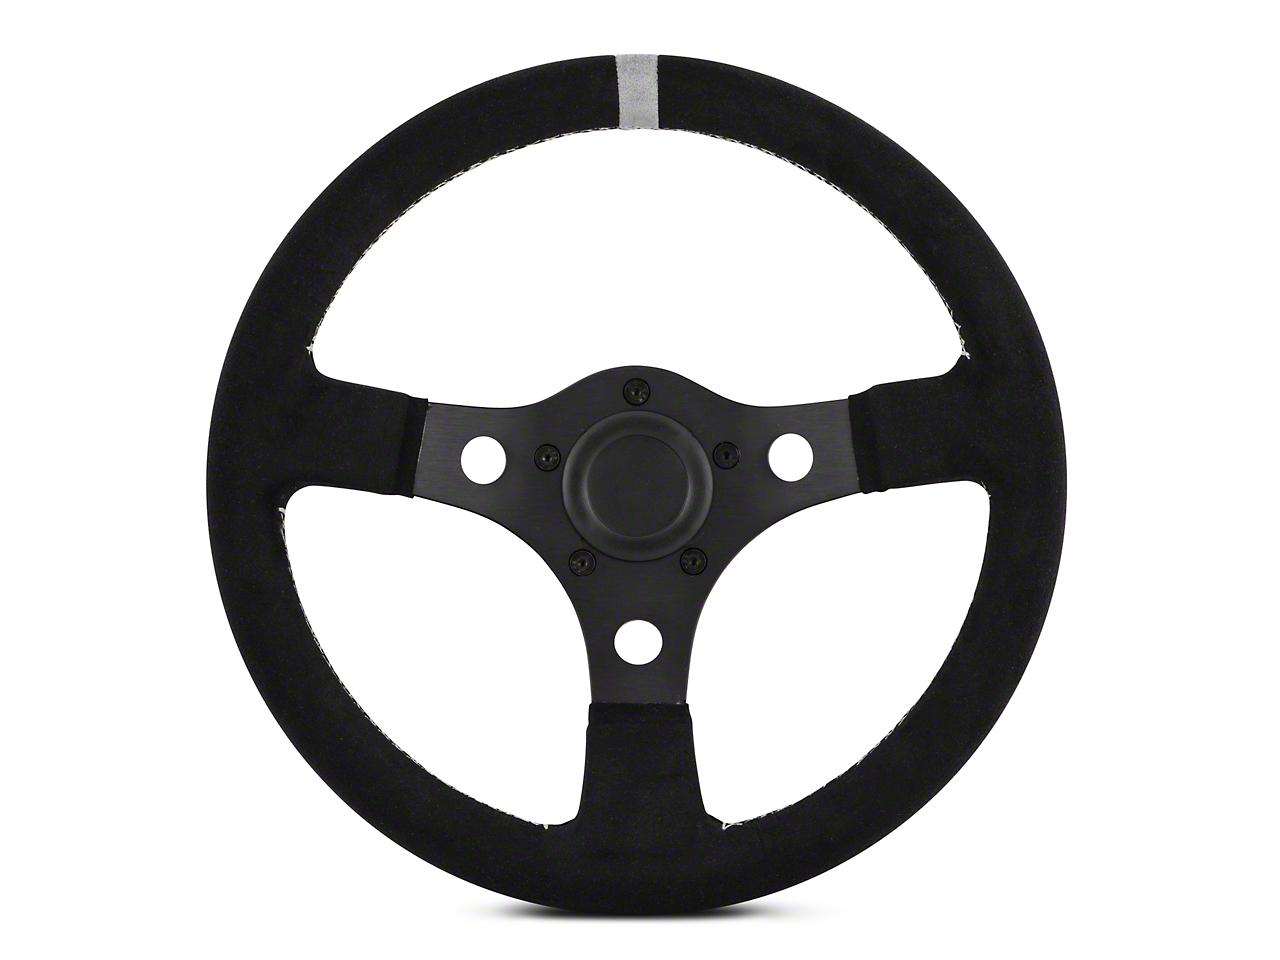 MMD 13 in. Black Suede Performance Steering Wheel - Gray Center Stripe (84-14 All)